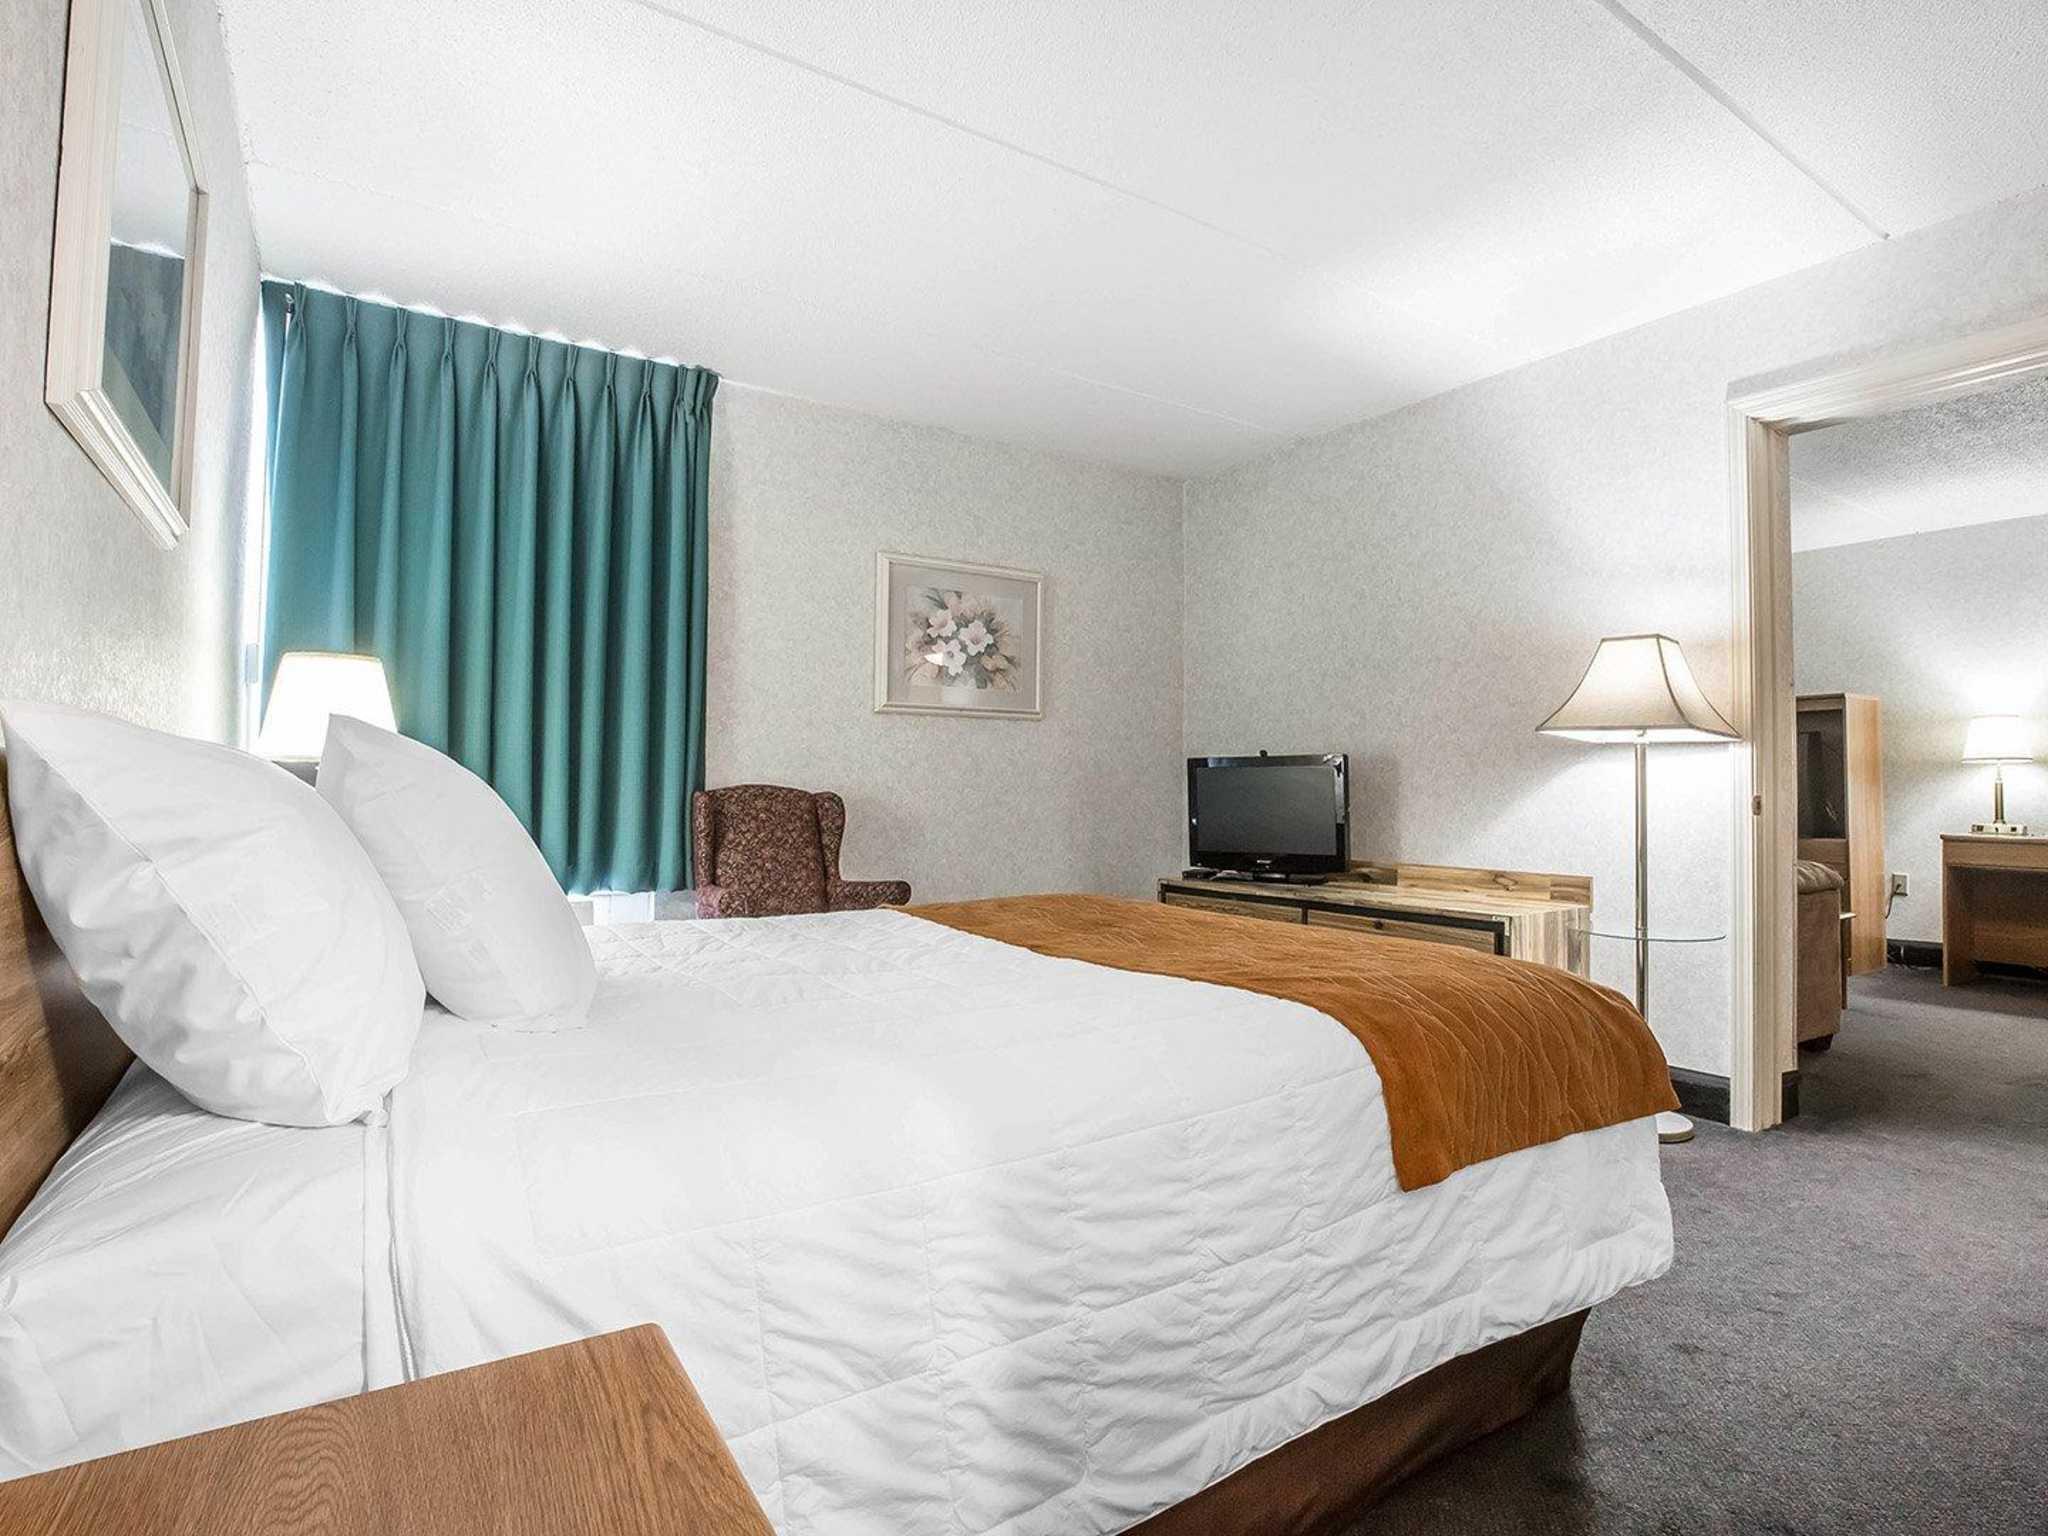 econo lodge inn suites in plattsburgh ny 12901. Black Bedroom Furniture Sets. Home Design Ideas